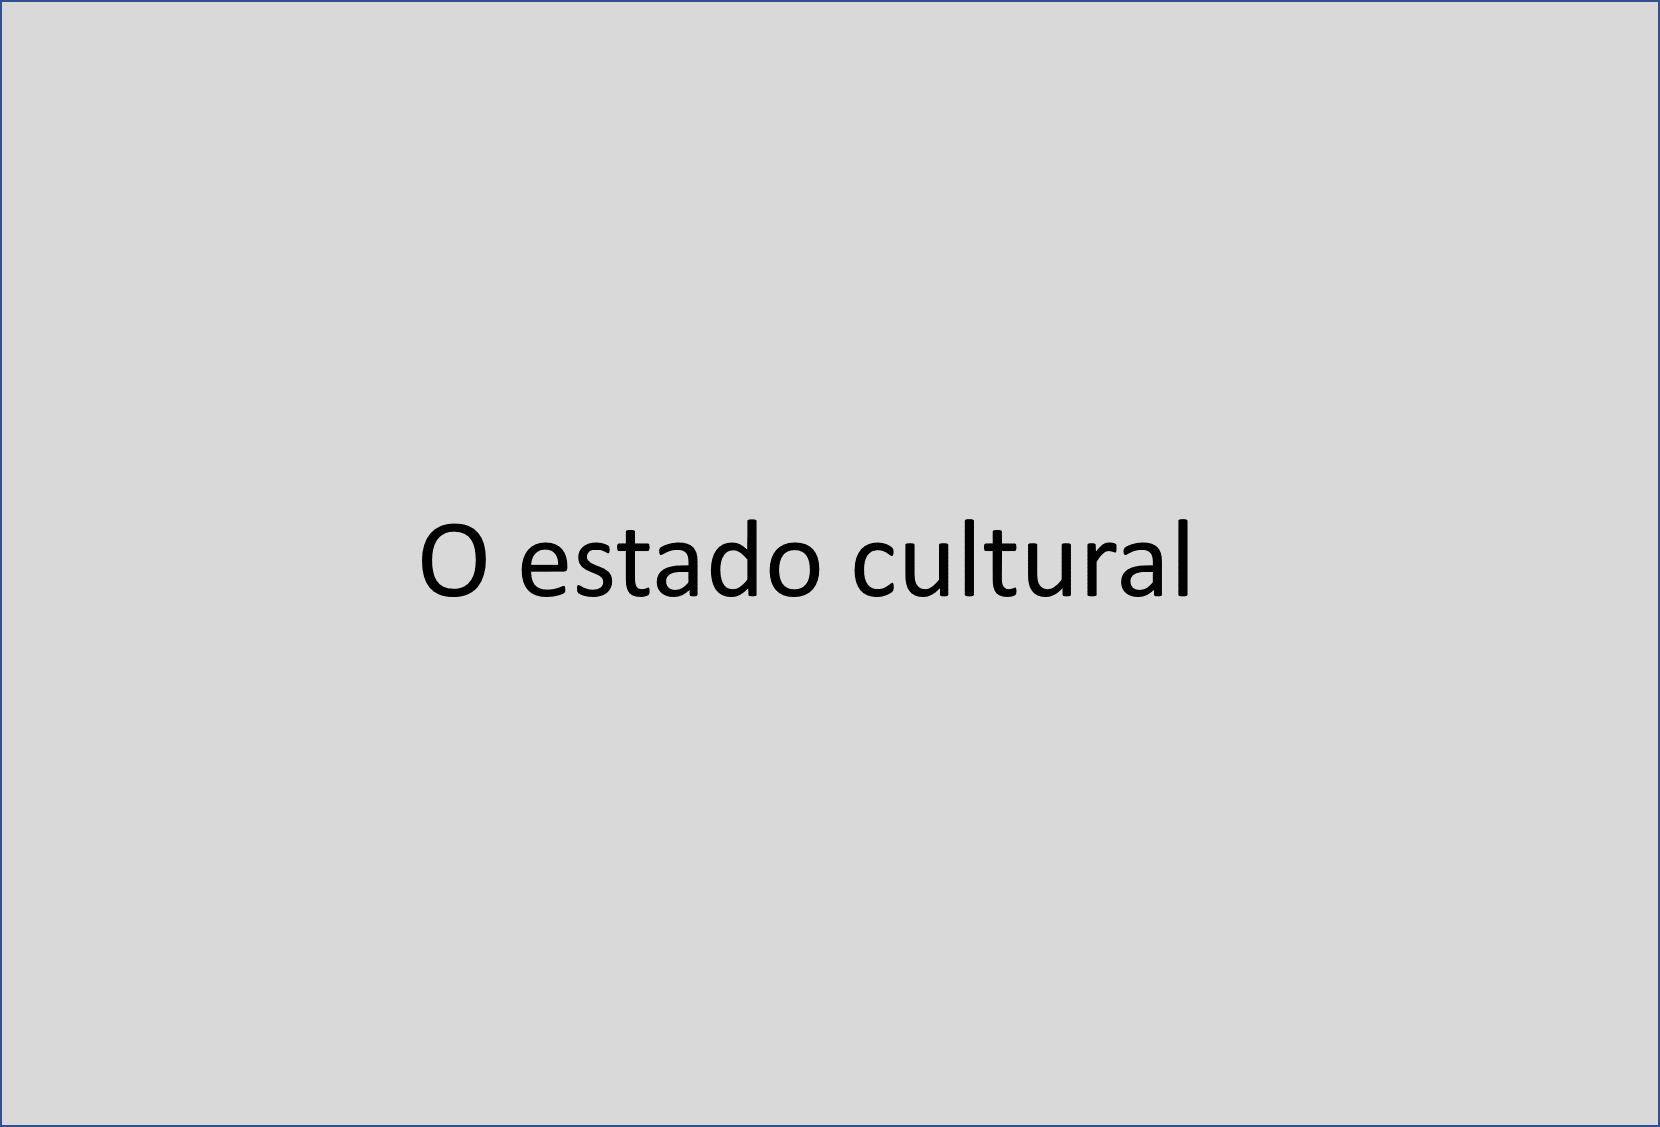 Estado cultural